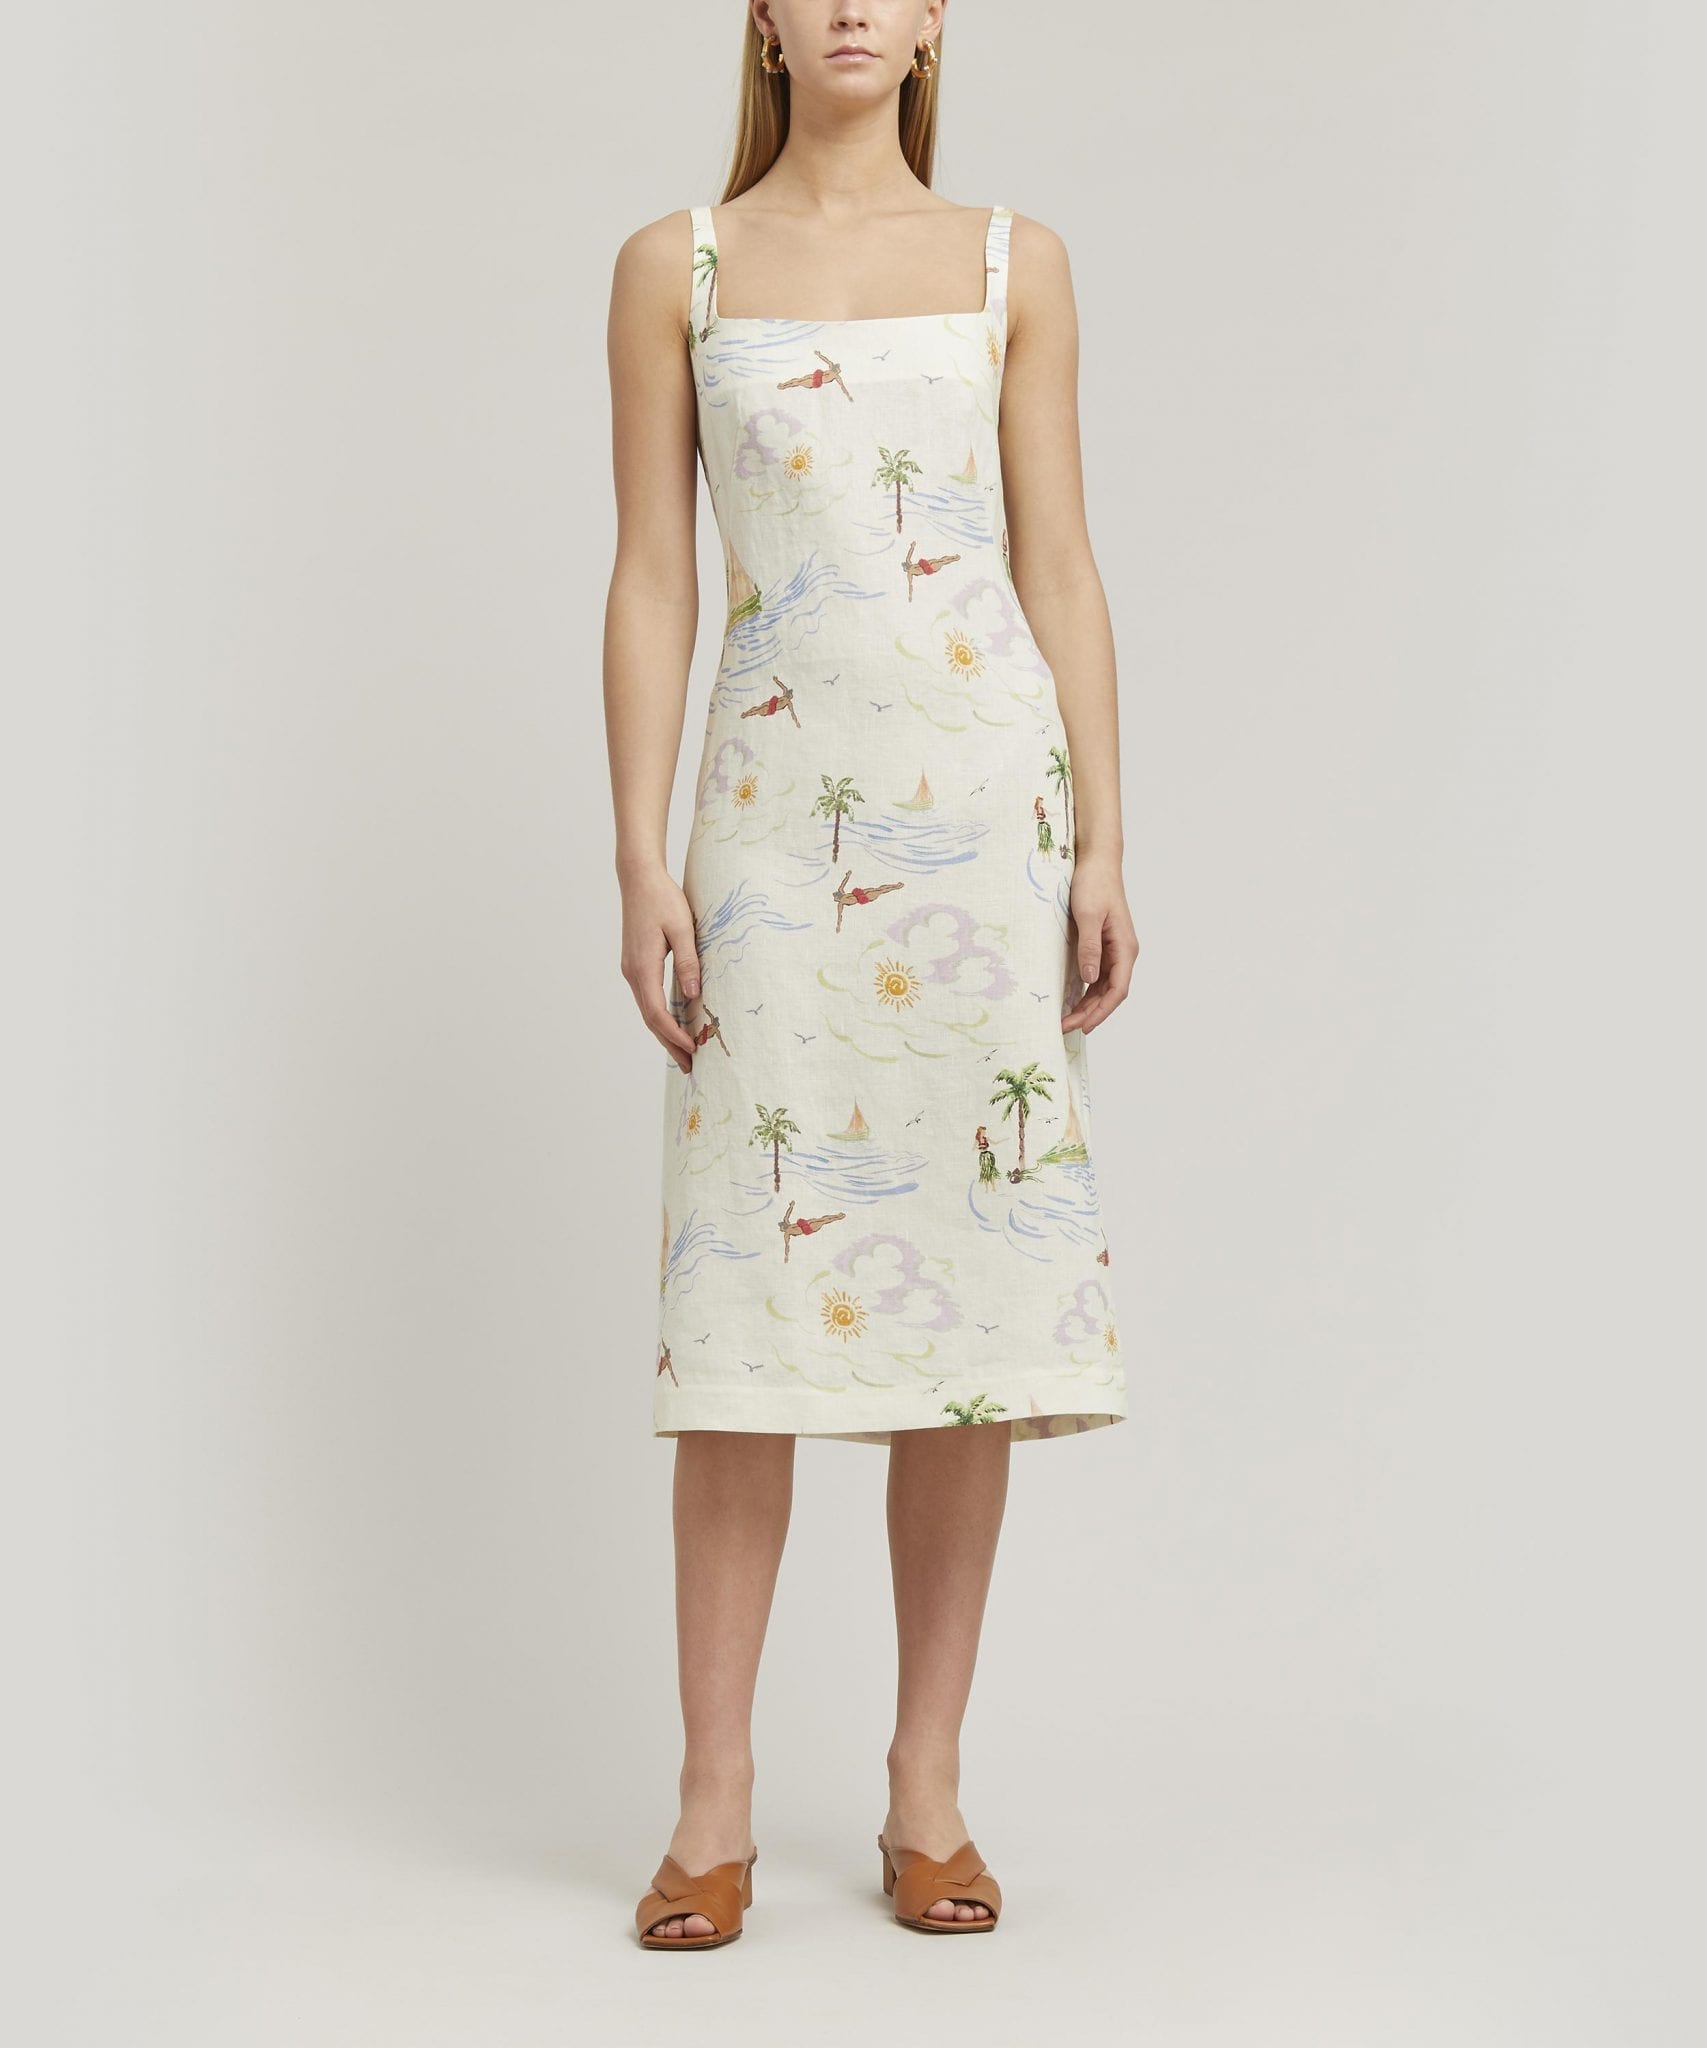 REJINA PYO Emilia Linen Midi-Dress